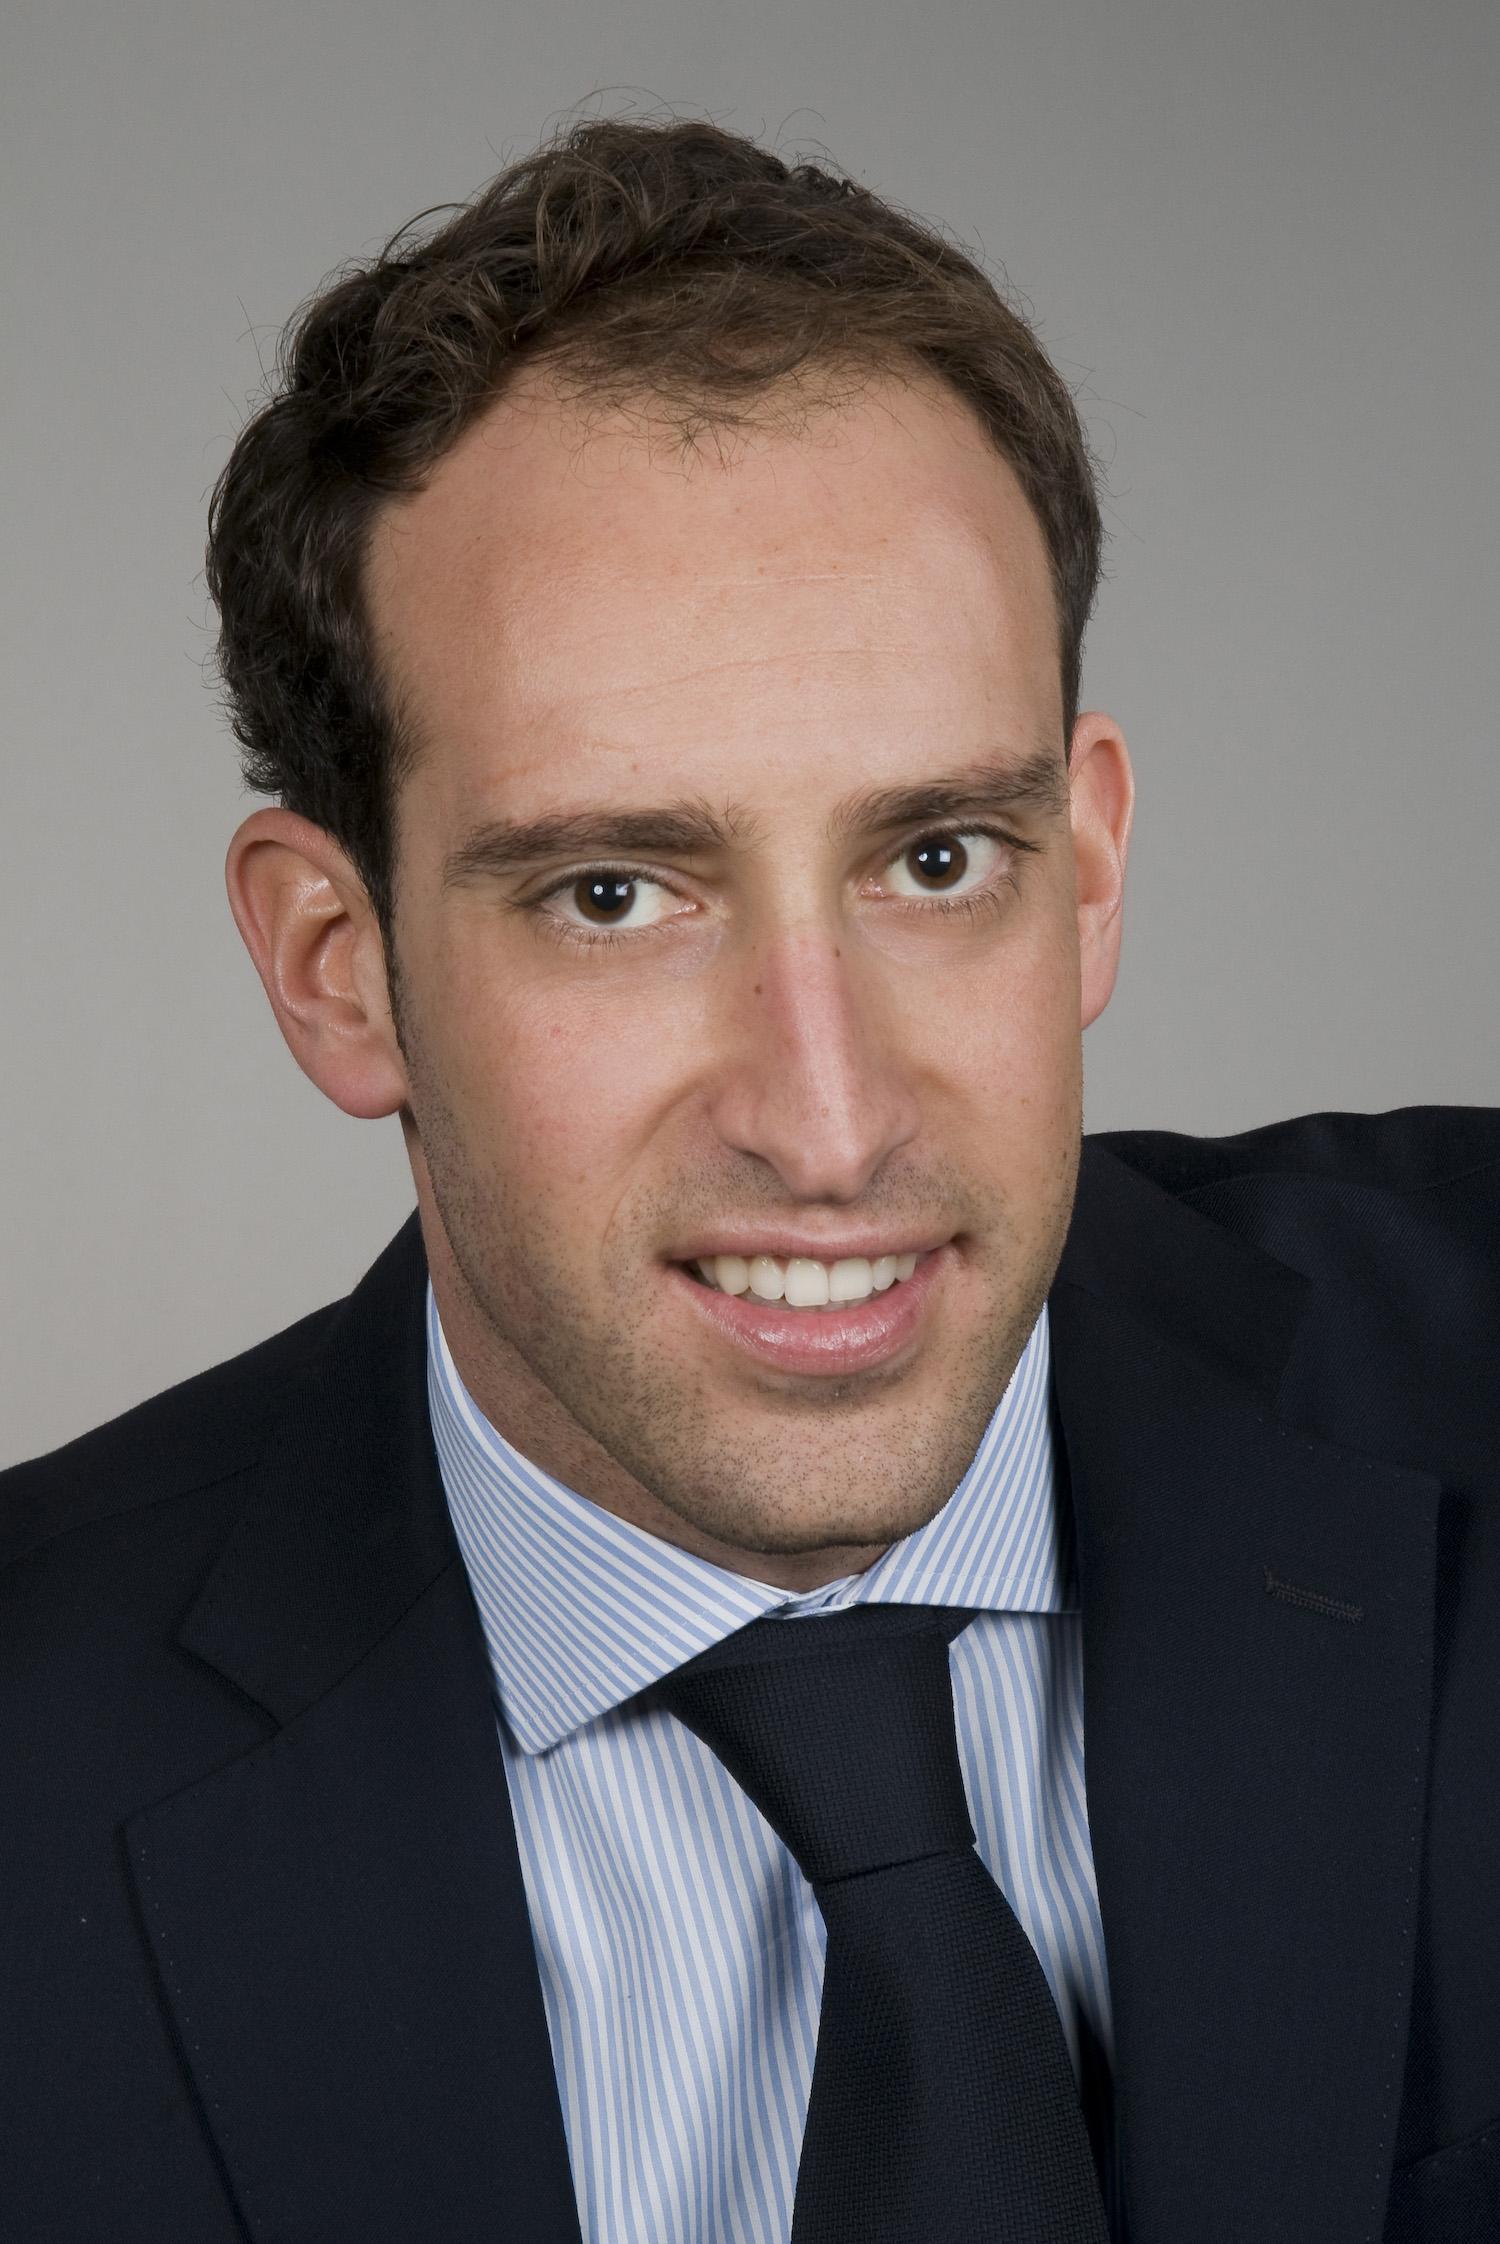 Mauro Amato